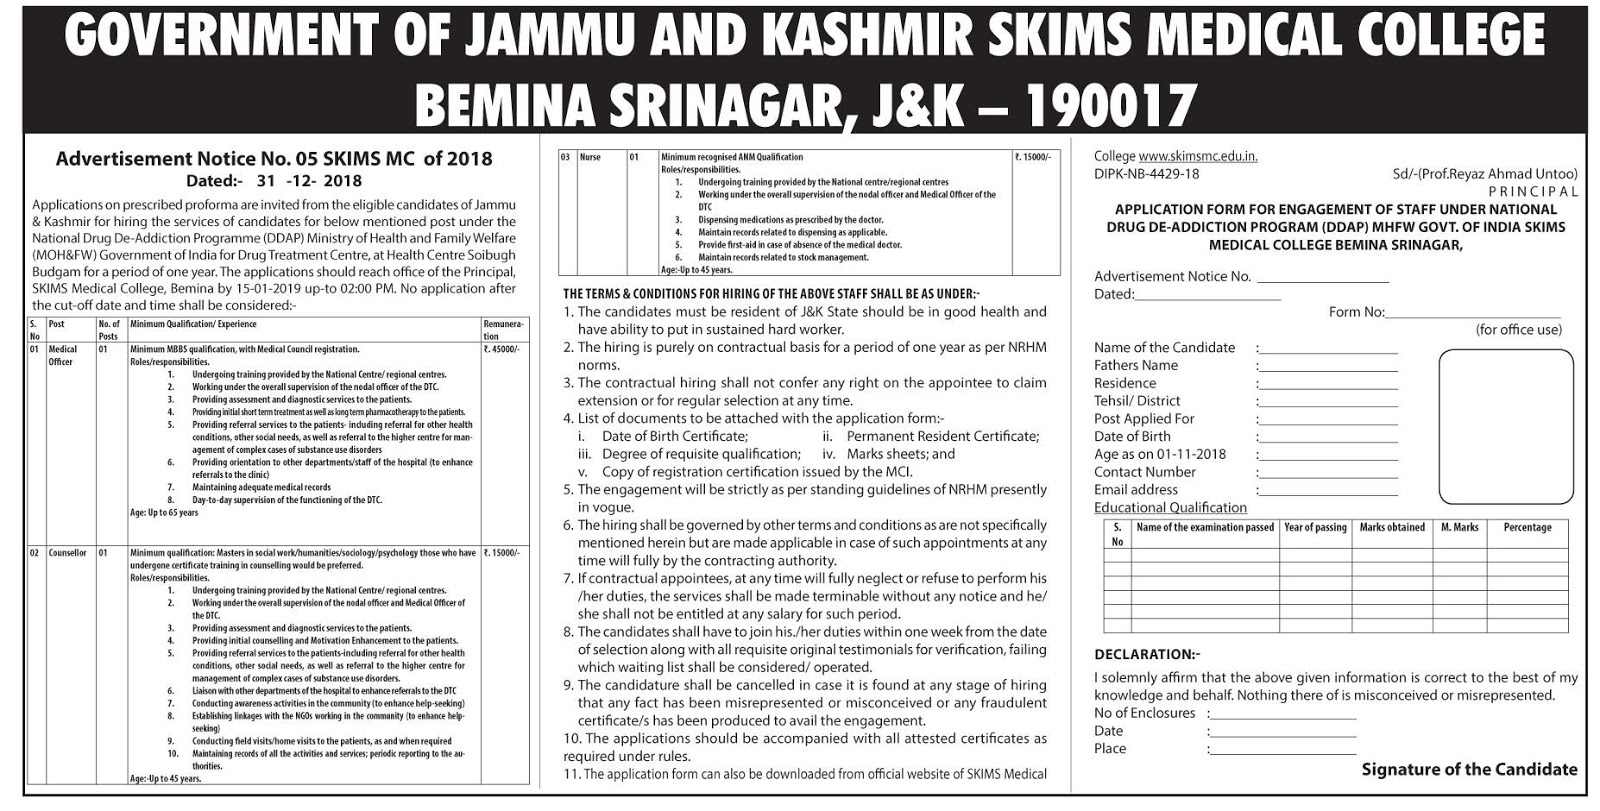 SKIMS Medical College Recruitment 2019 under National Drug De-Addiction Programme